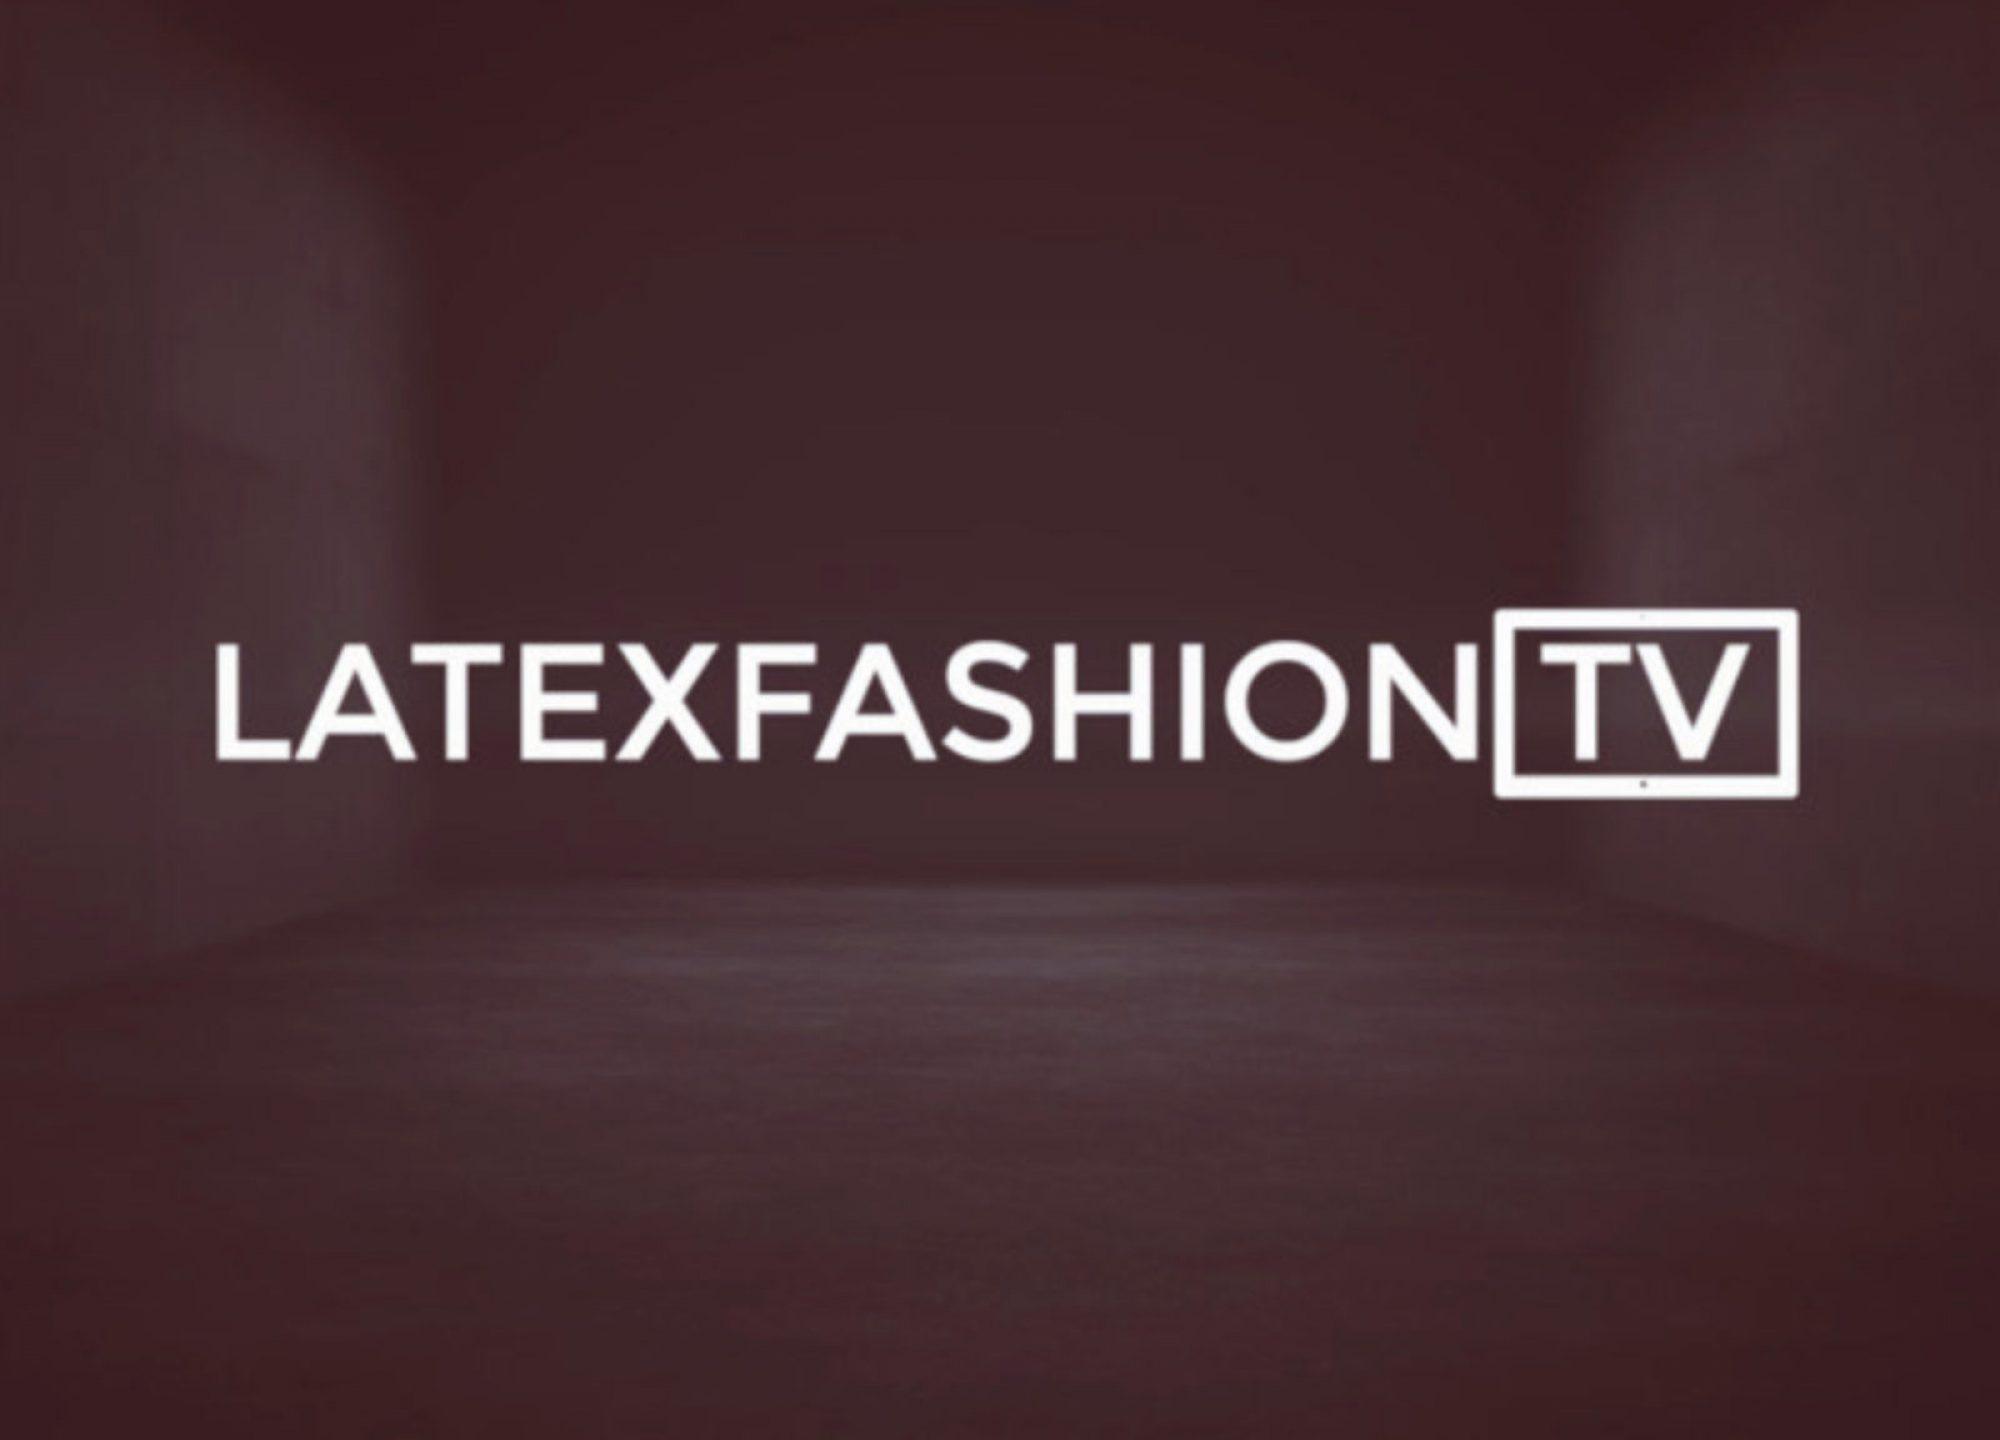 LATEXFASHIONTV